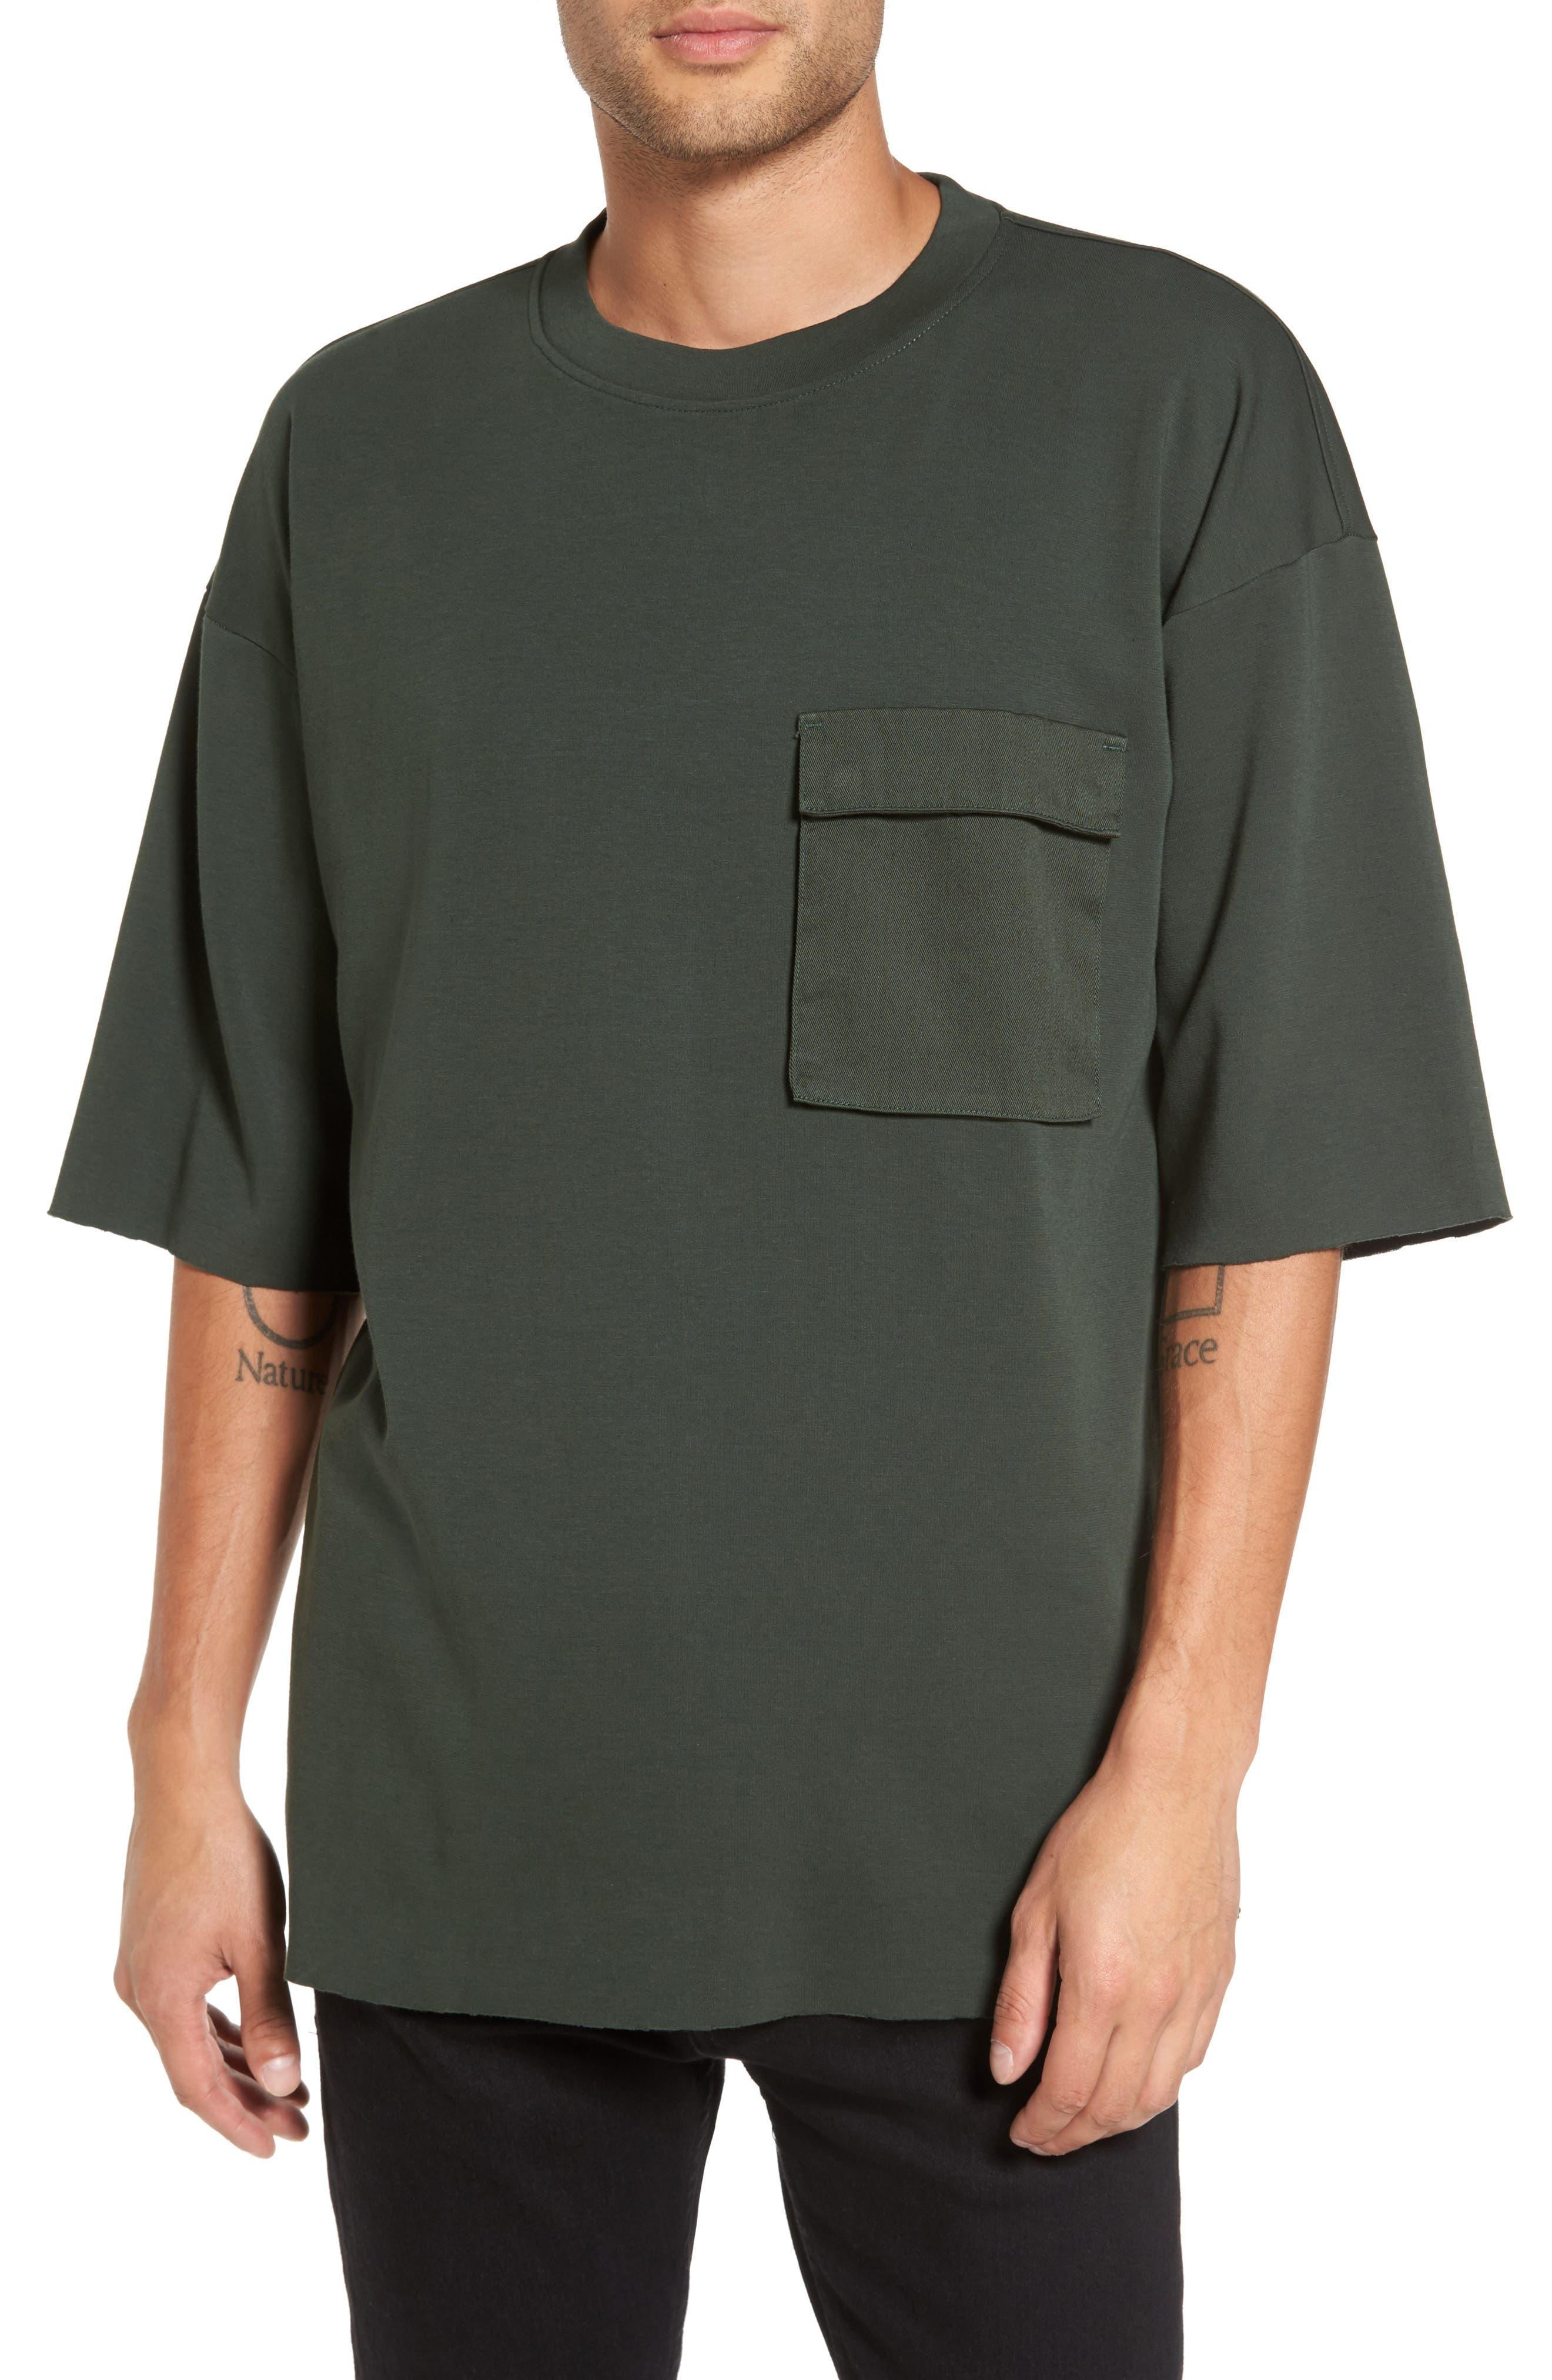 Mauno Pocket T-Shirt,                         Main,                         color, 300